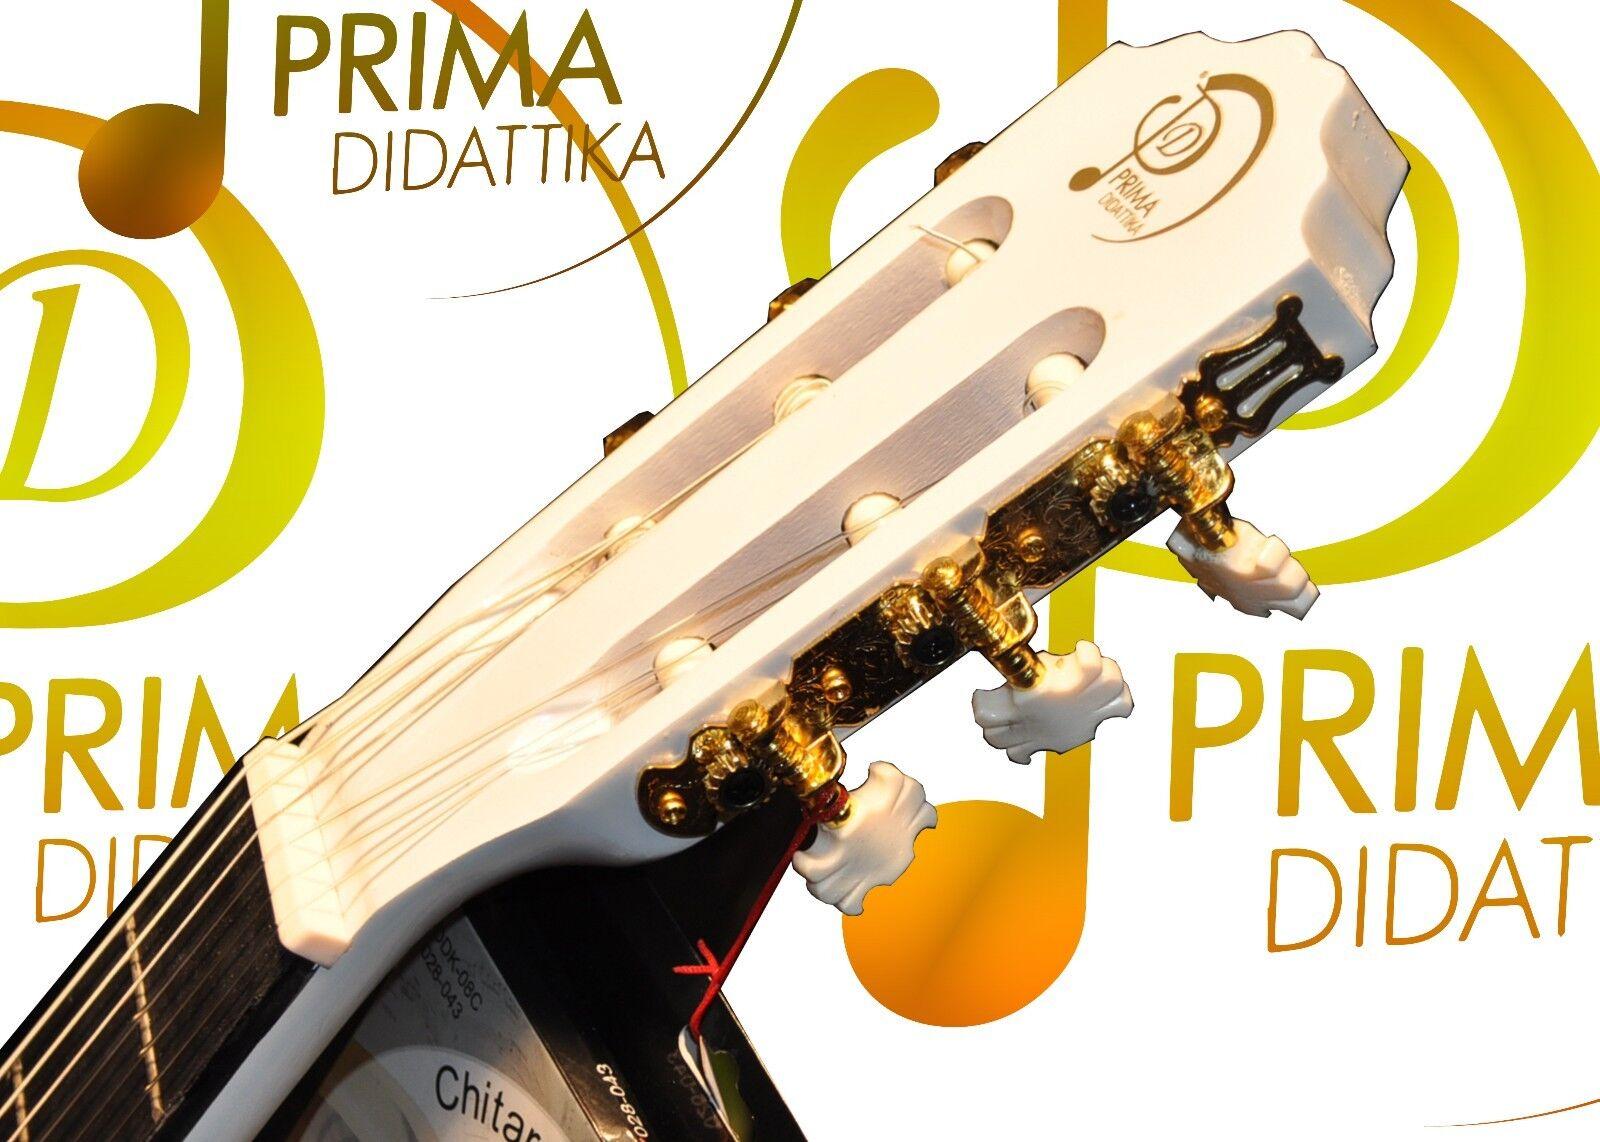 Prima Didattika 3 Student Life Chitarra Classica 3 Didattika 4 Bianca Con Borsa Bespeco d7eae5